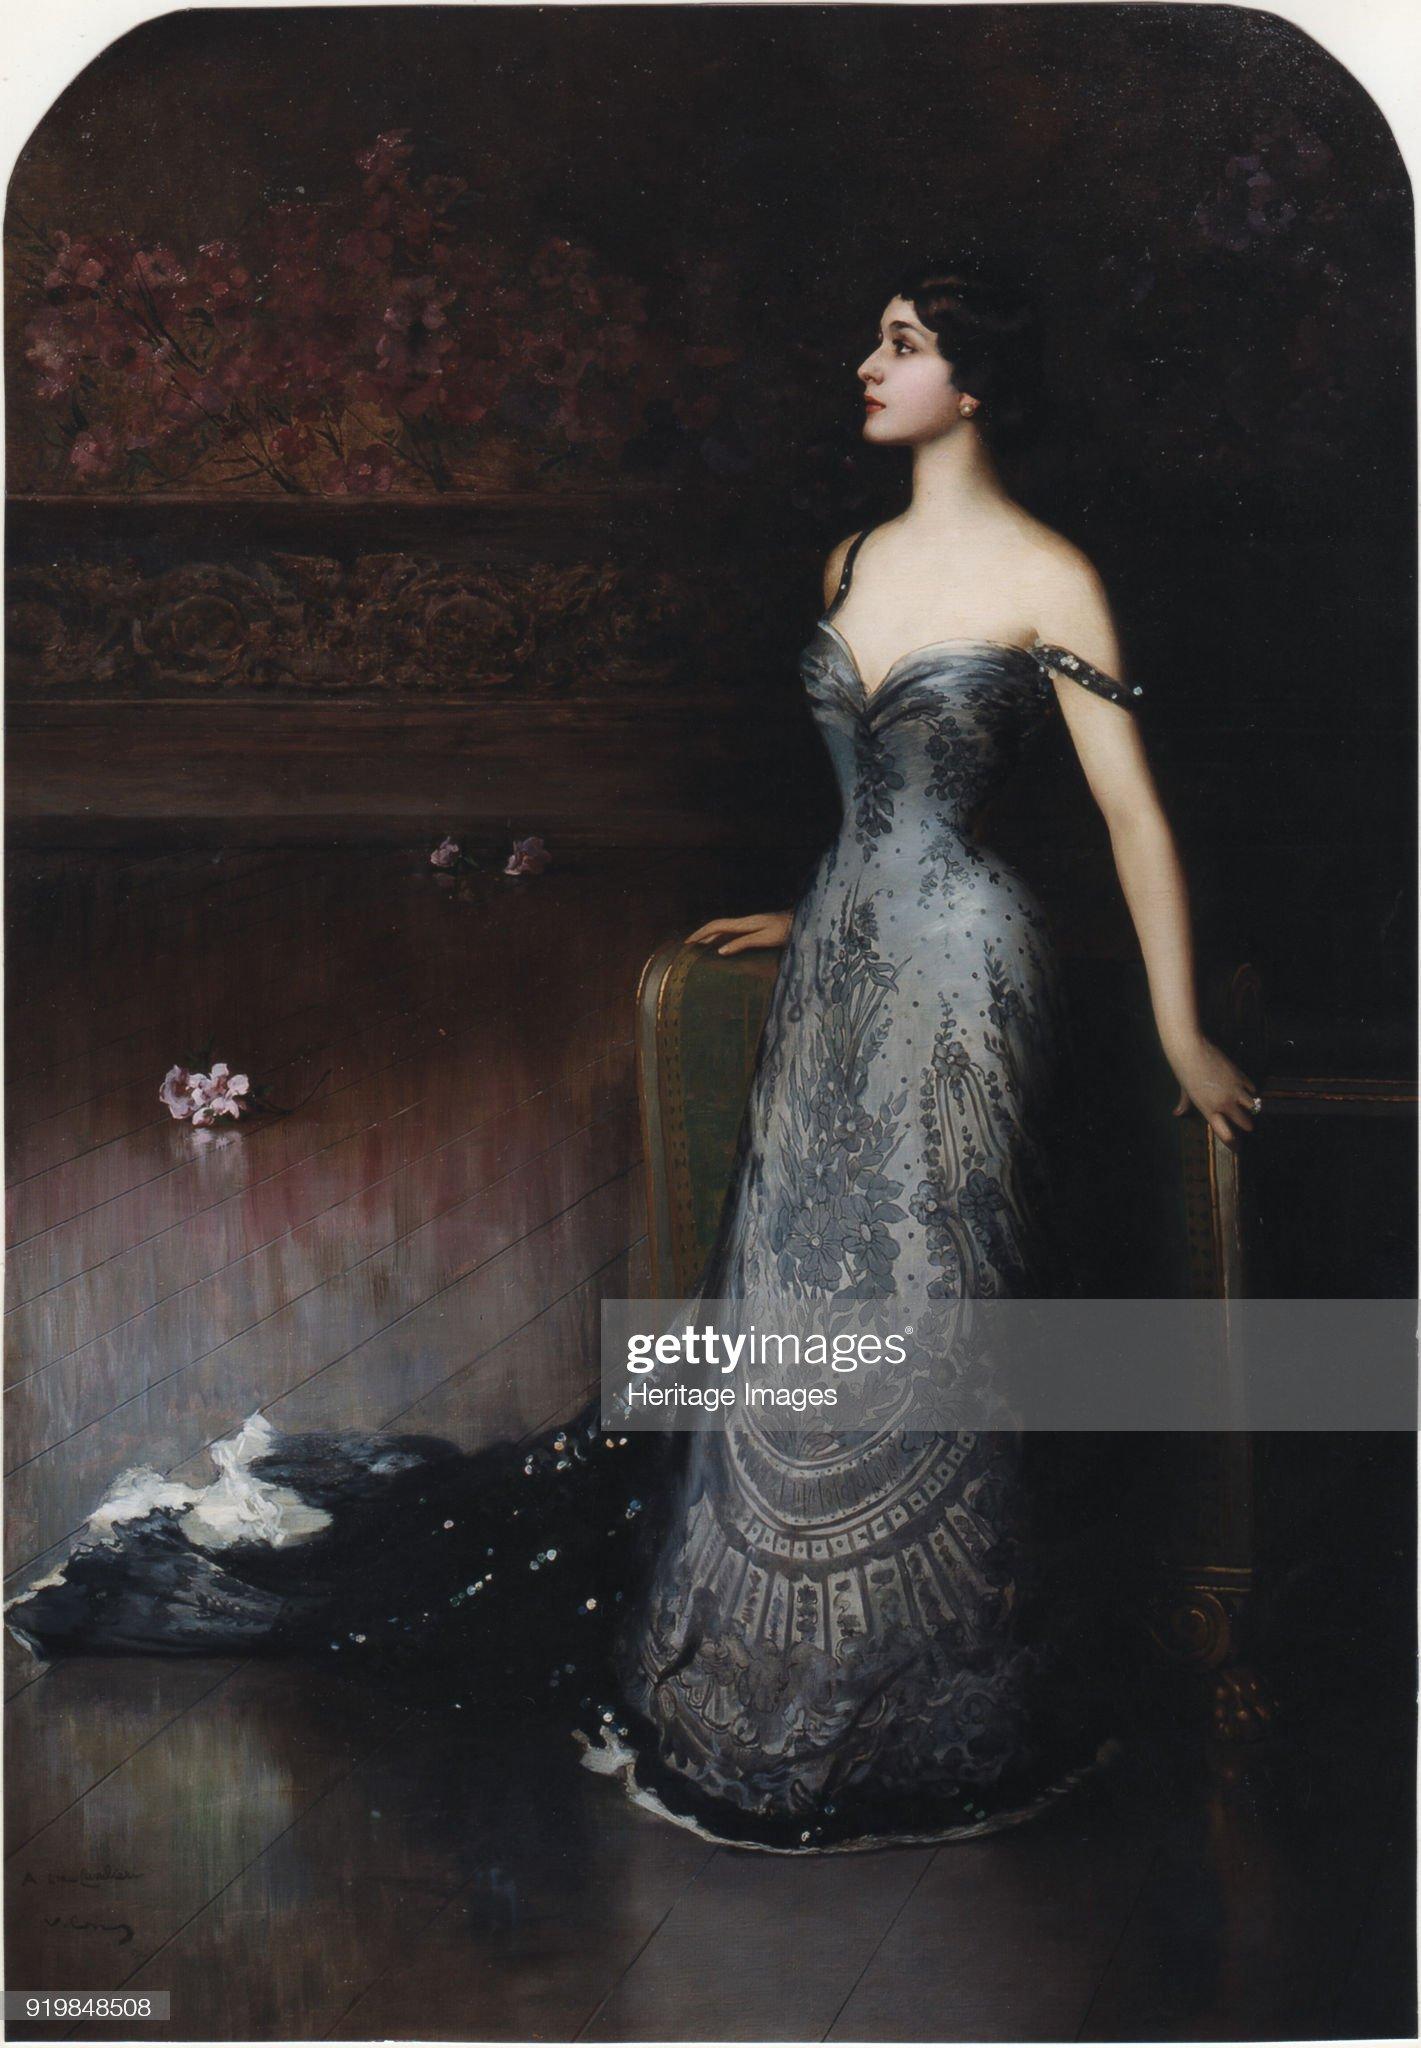 Portrait Of The Opera Singer Lina Cavalieri (1874-1944) : News Photo